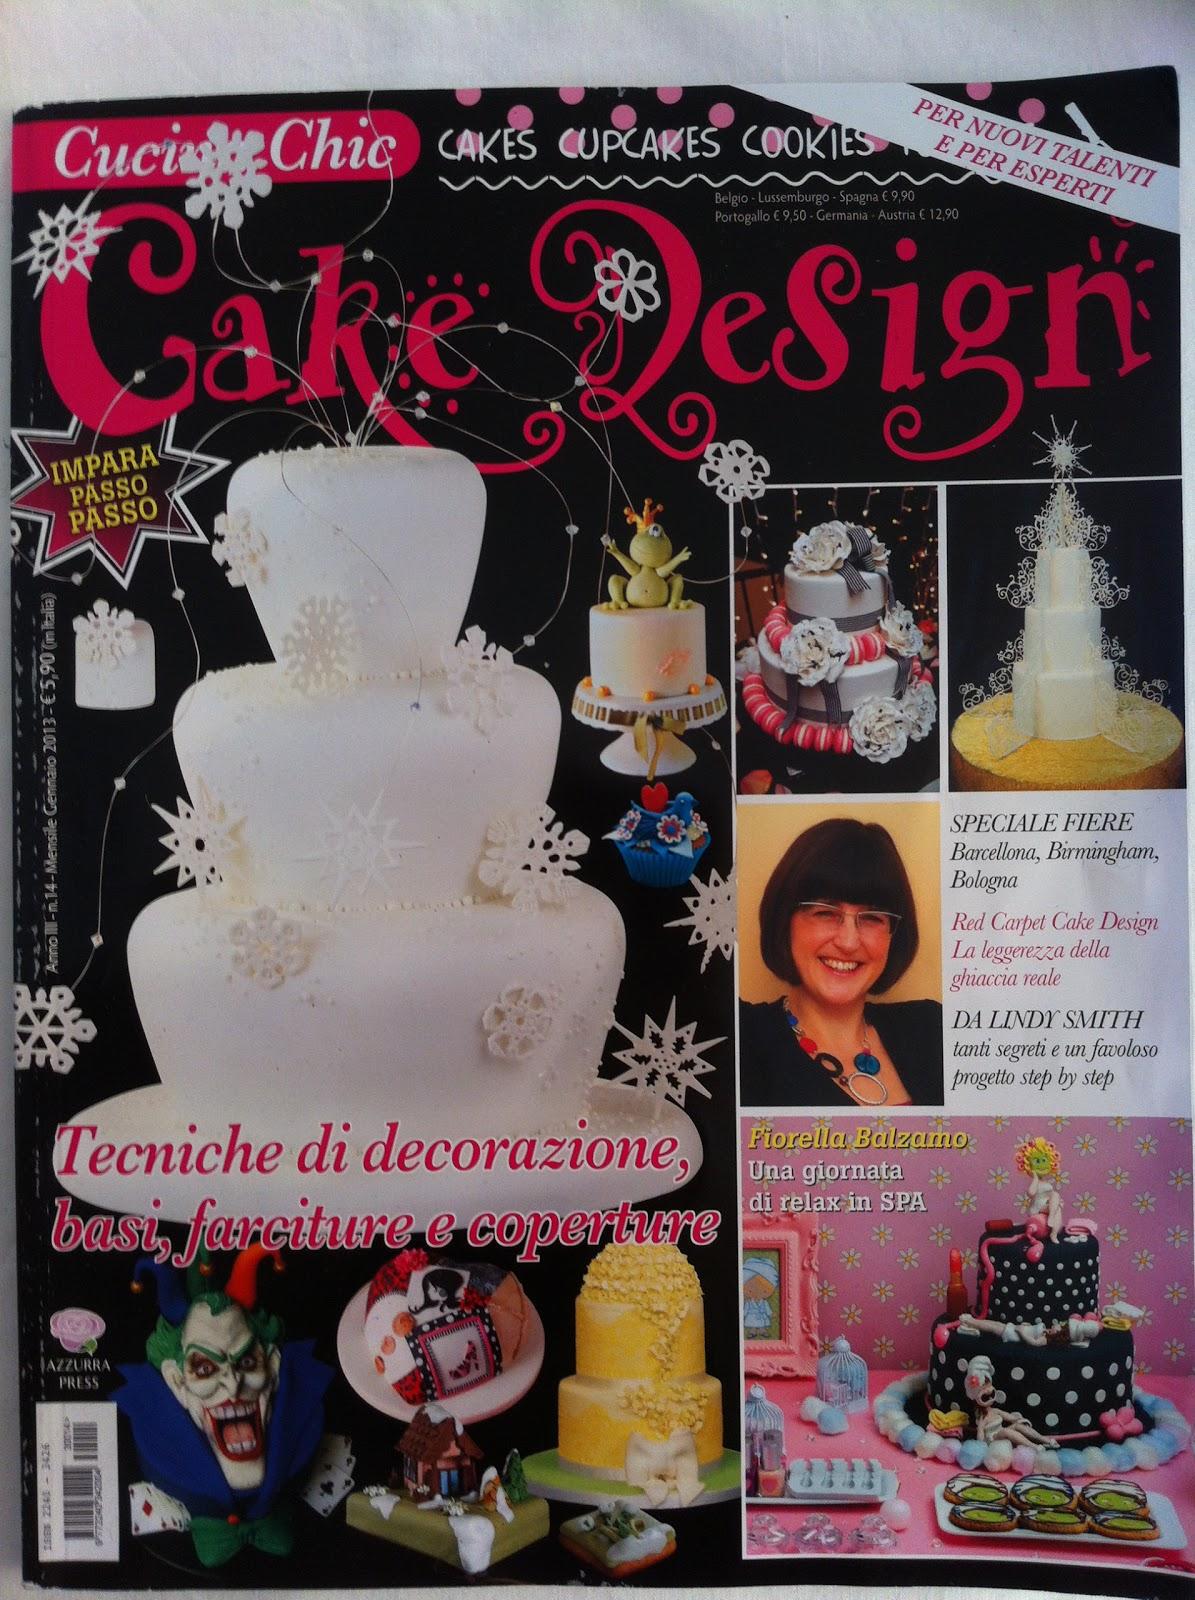 PASSO PASSO TORTA INVERNALE SU CUCINA CHIC CAKE DESIGN-by ...